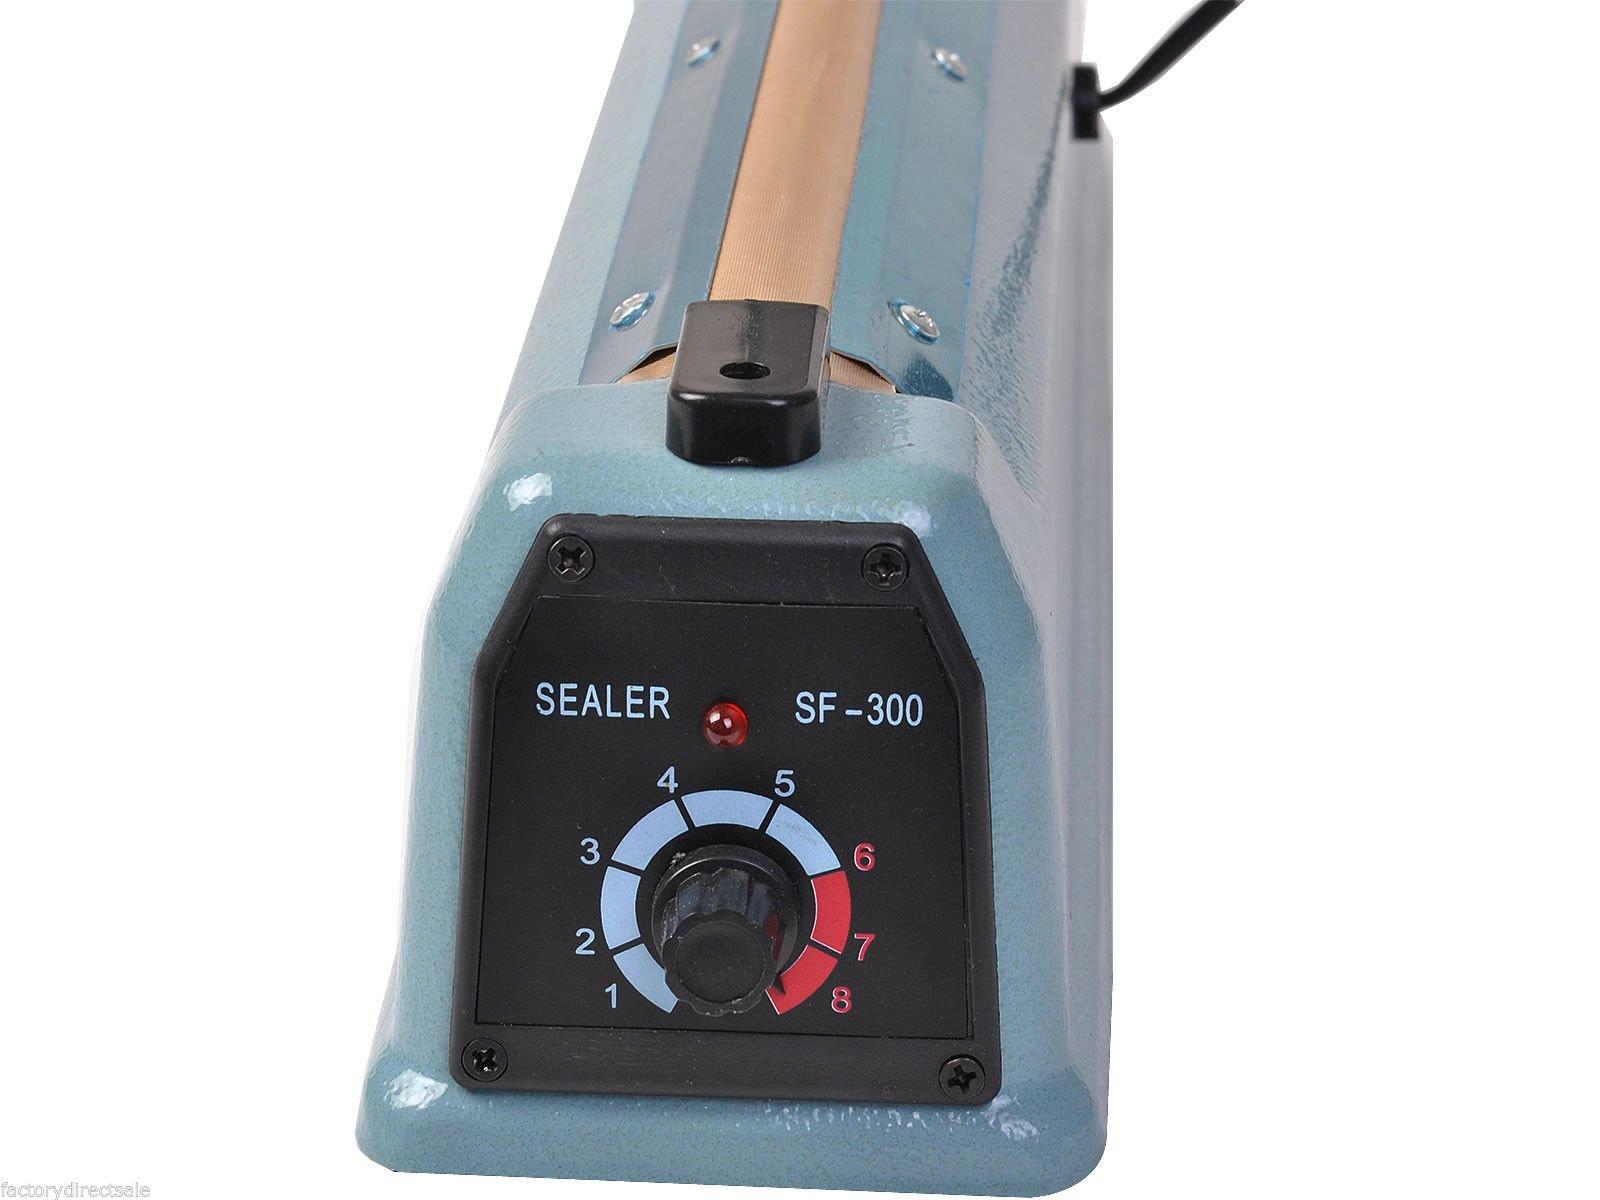 COLIBROX-- 12'' Heat Sealing Hand Impulse Sealer Machine Poly Free Element Plastic Sealer 8''12''16'' Heat Sealing Hand Impulse Sealer Machine Poly Element Plastic Sealer